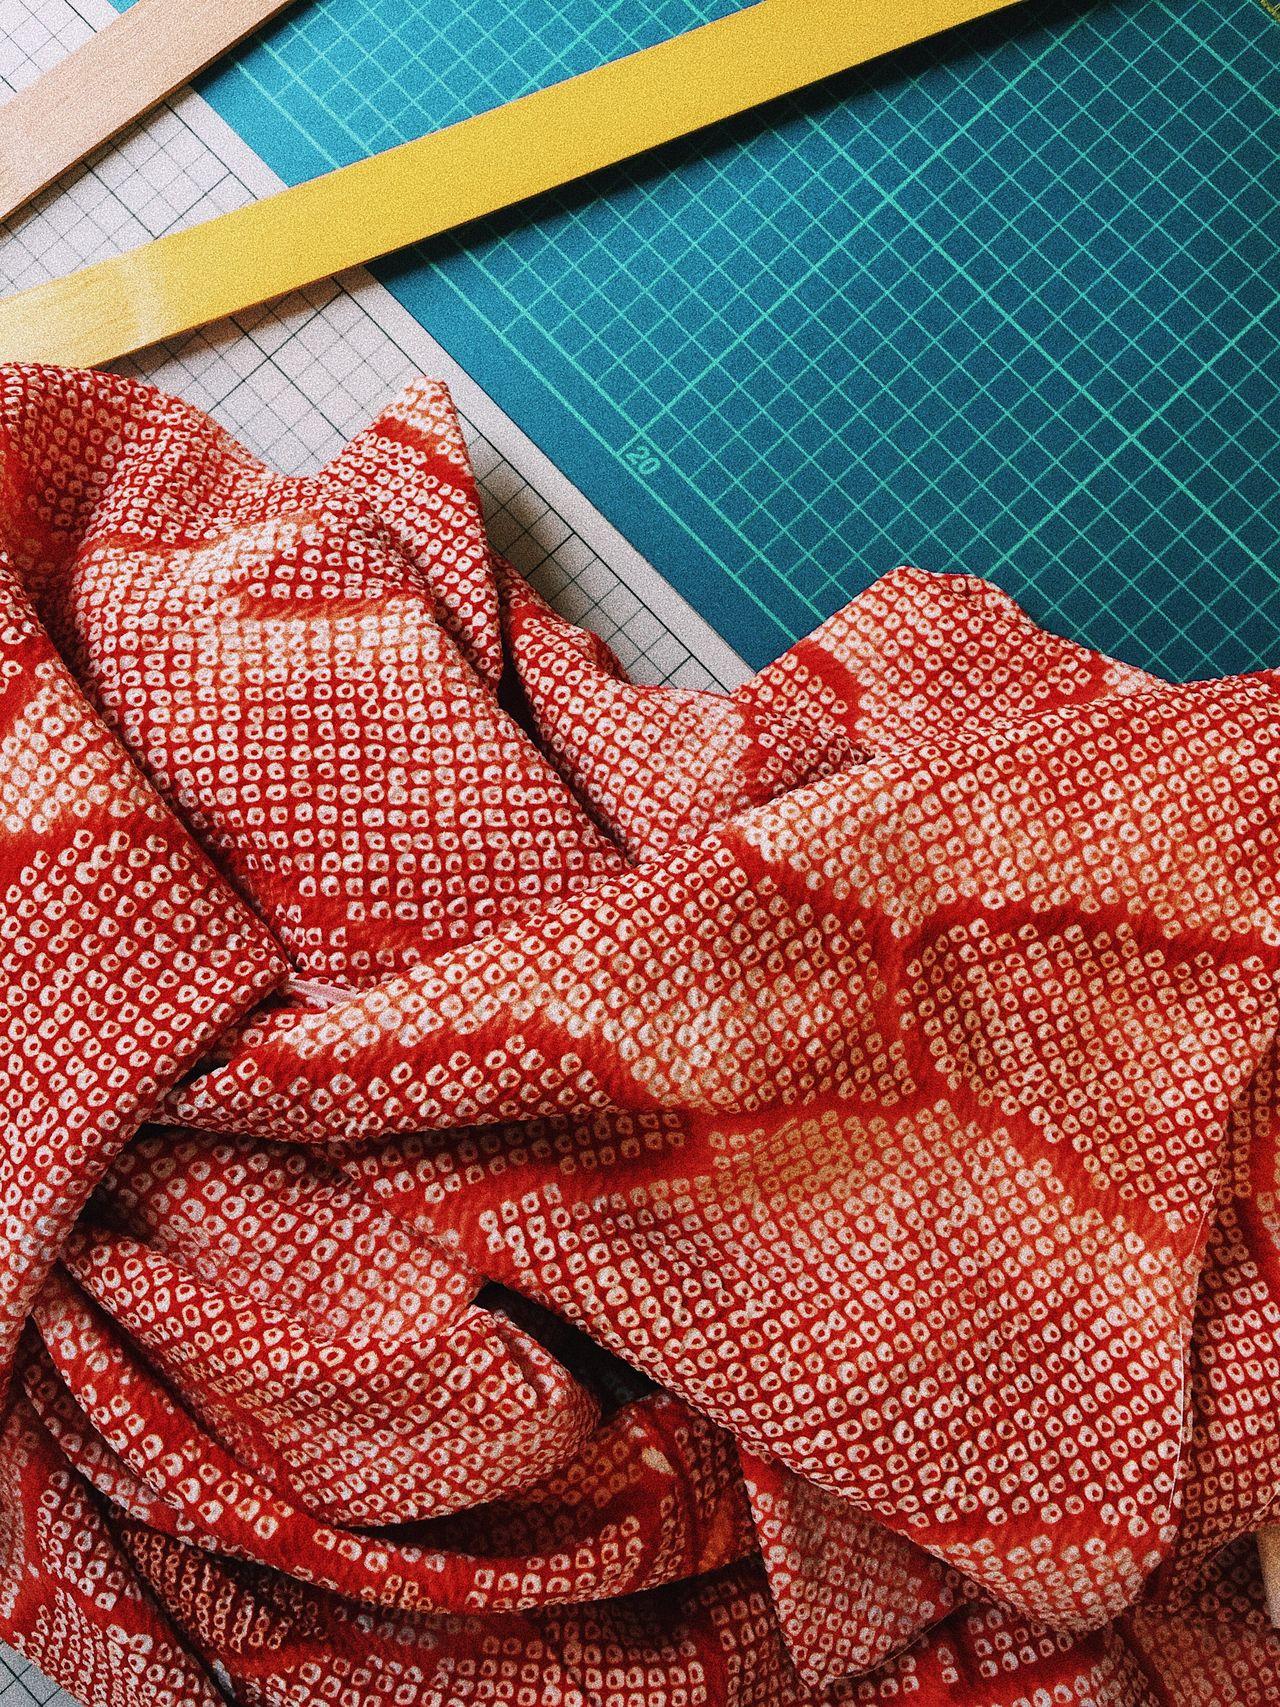 Kimono fabric. Kimono Fabric Sewing